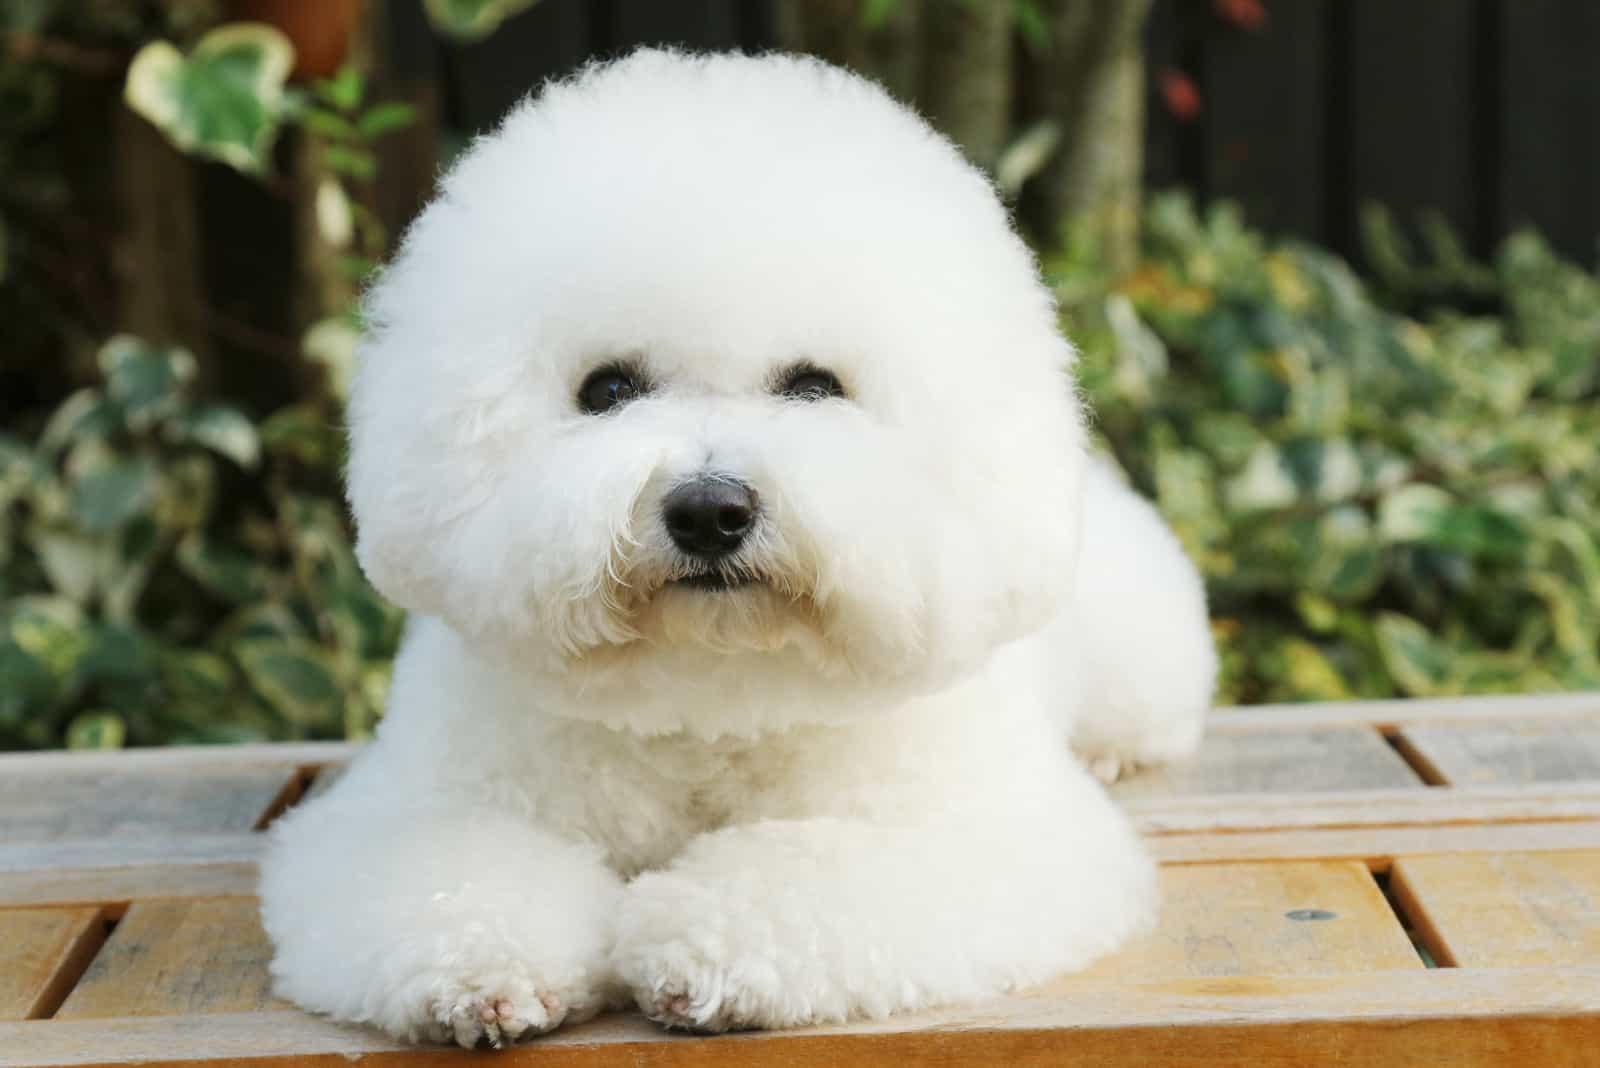 cute little Bichon Frise dog lying